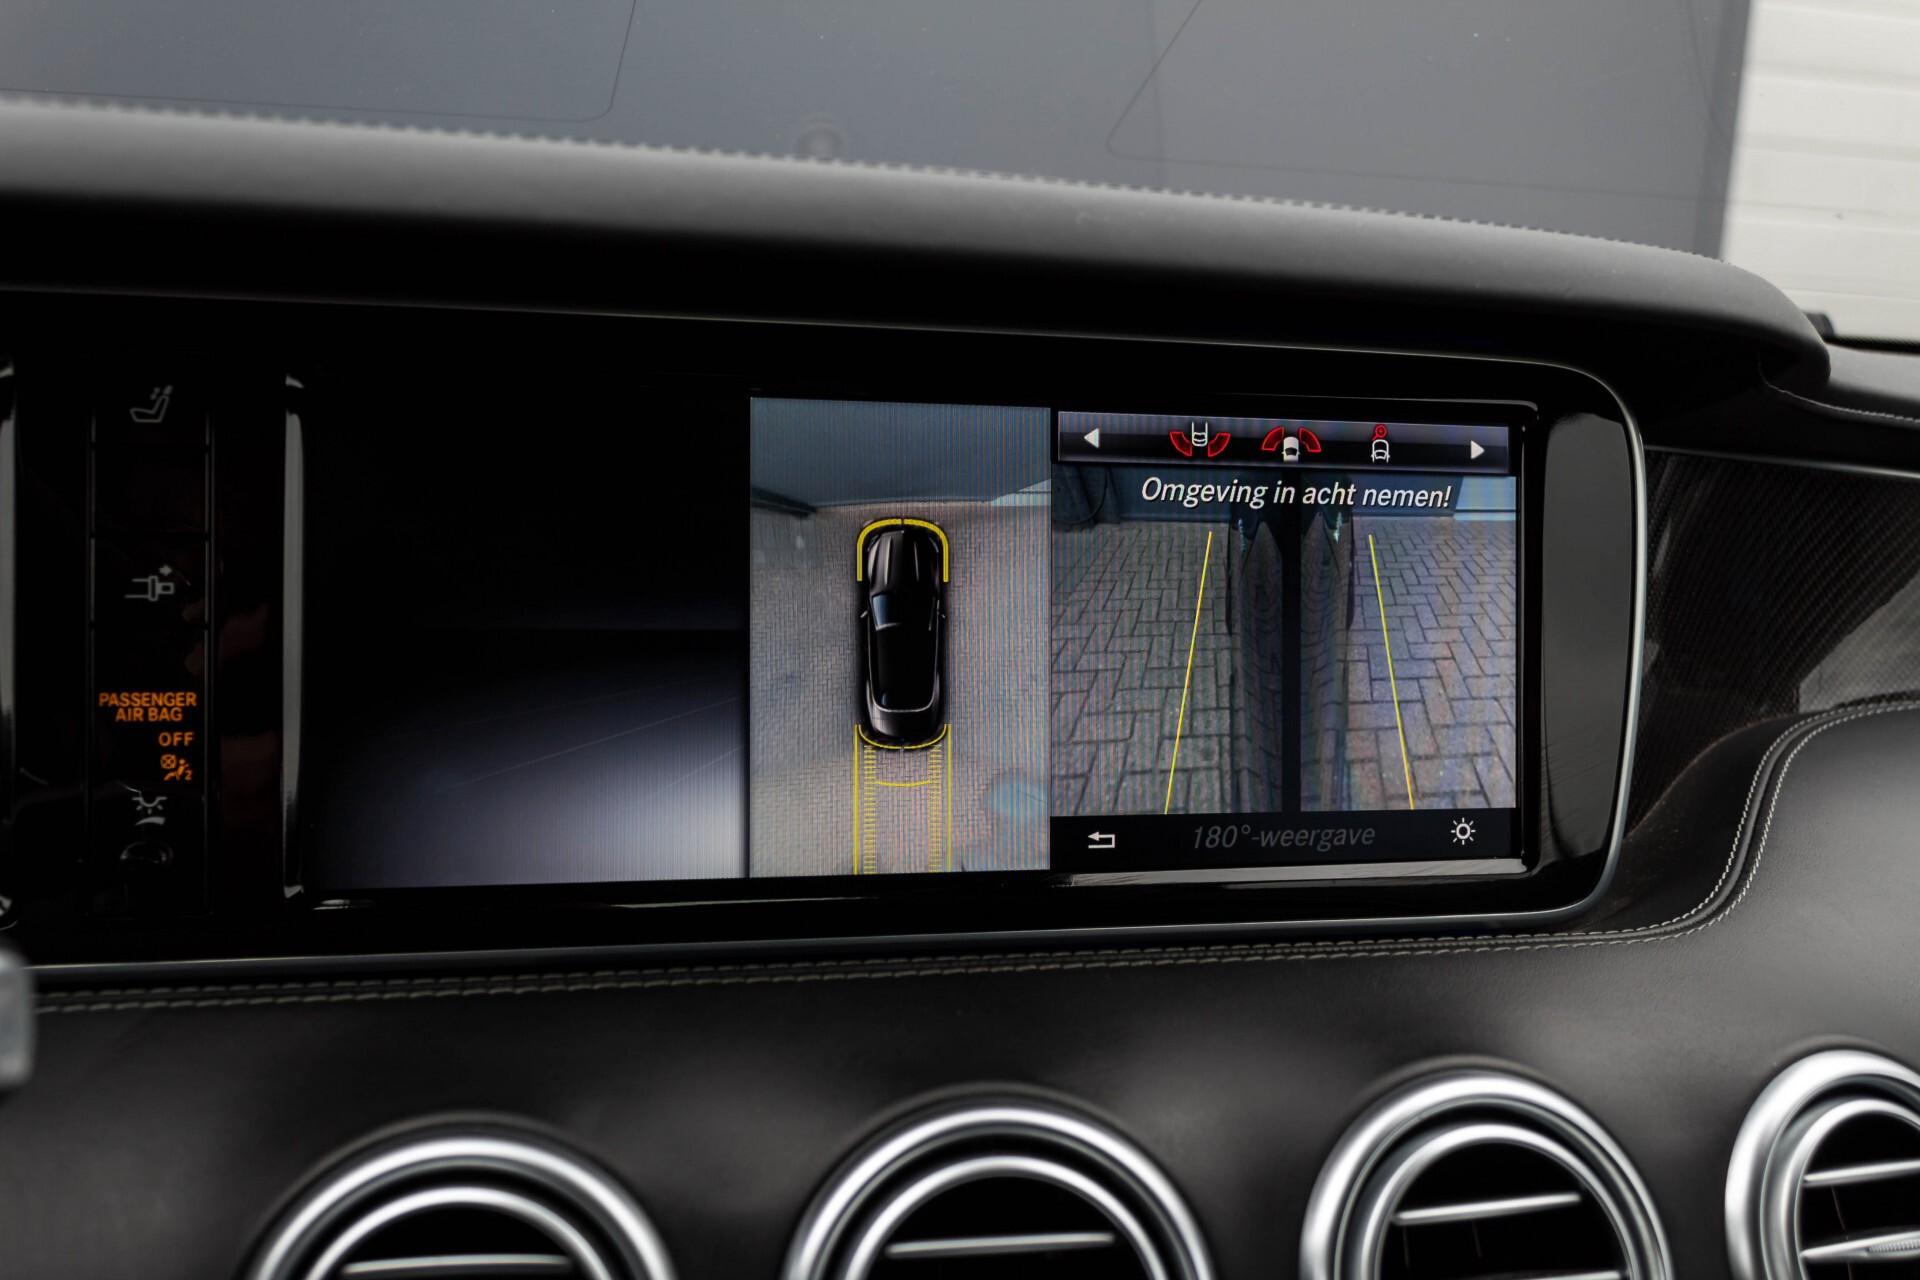 Mercedes-Benz S-Klasse Cabrio 63 AMG 4-M Ceramic/Designo/Carbon/Burmester High End Aut Foto 23